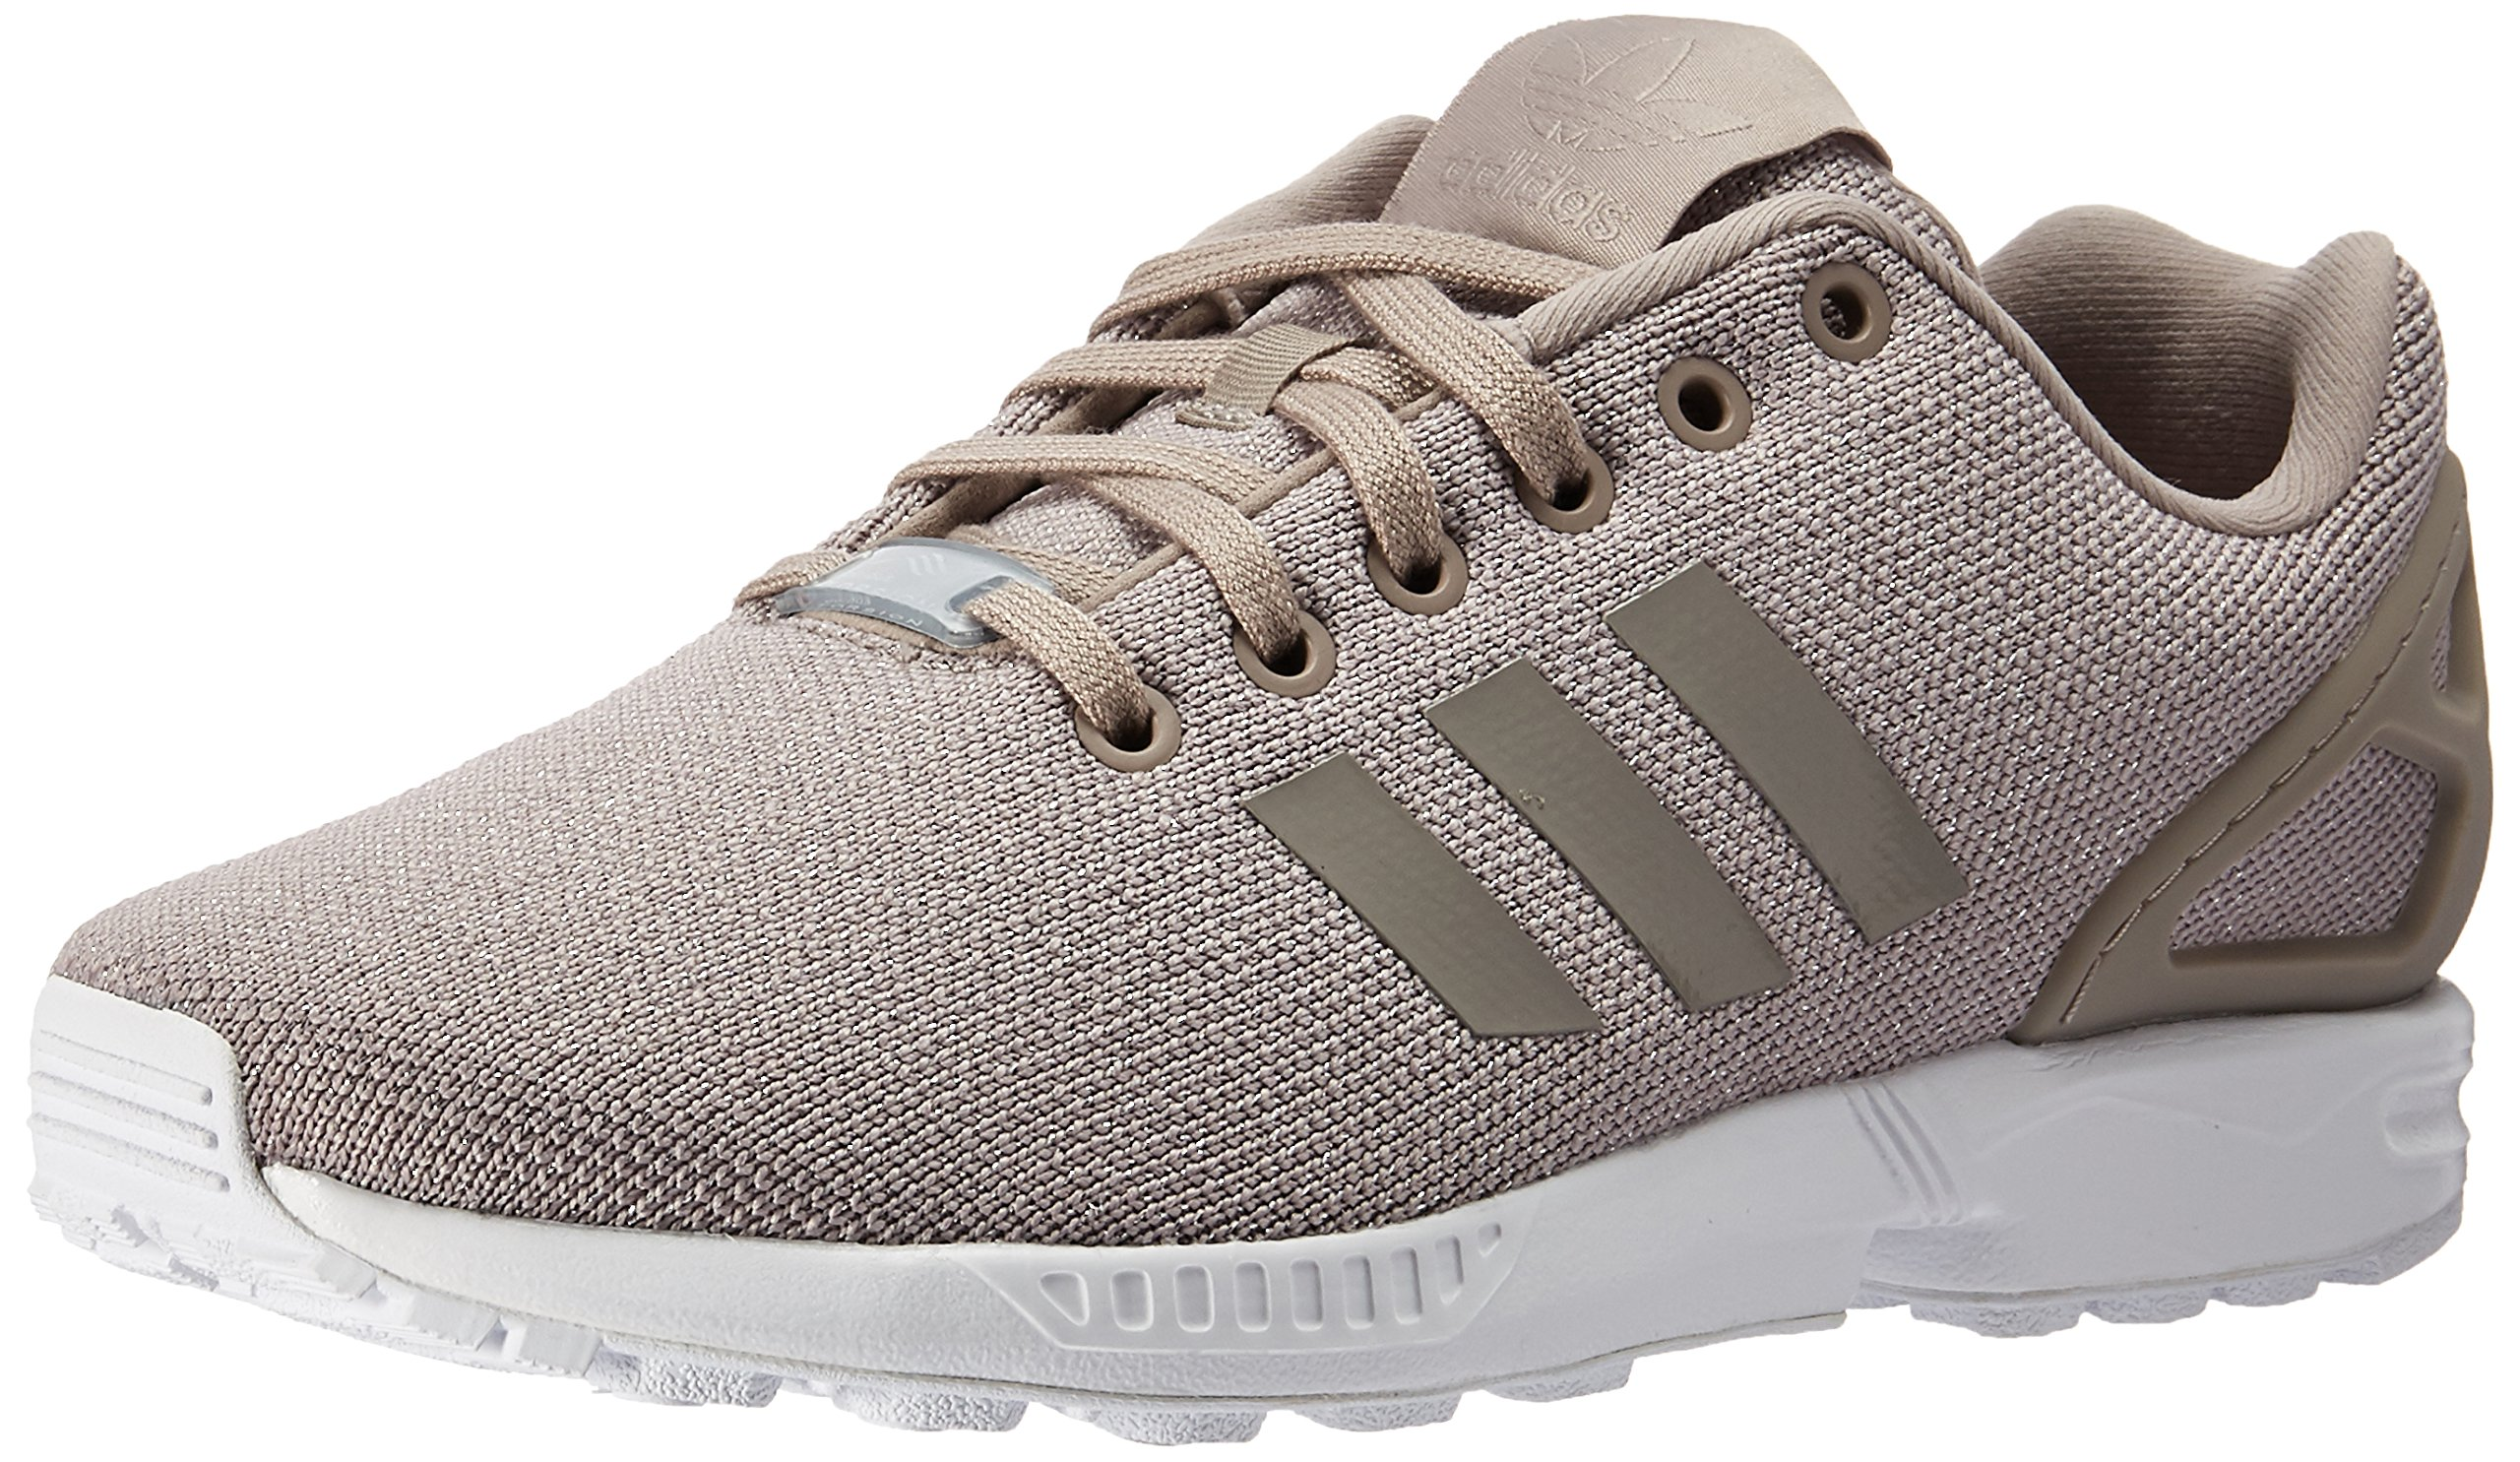 the latest e4db8 615ec adidas Originals Women's ZX Flux W Running Shoe Sneaker, Vapour Grey/Silver  Metallic, 5.5 M US